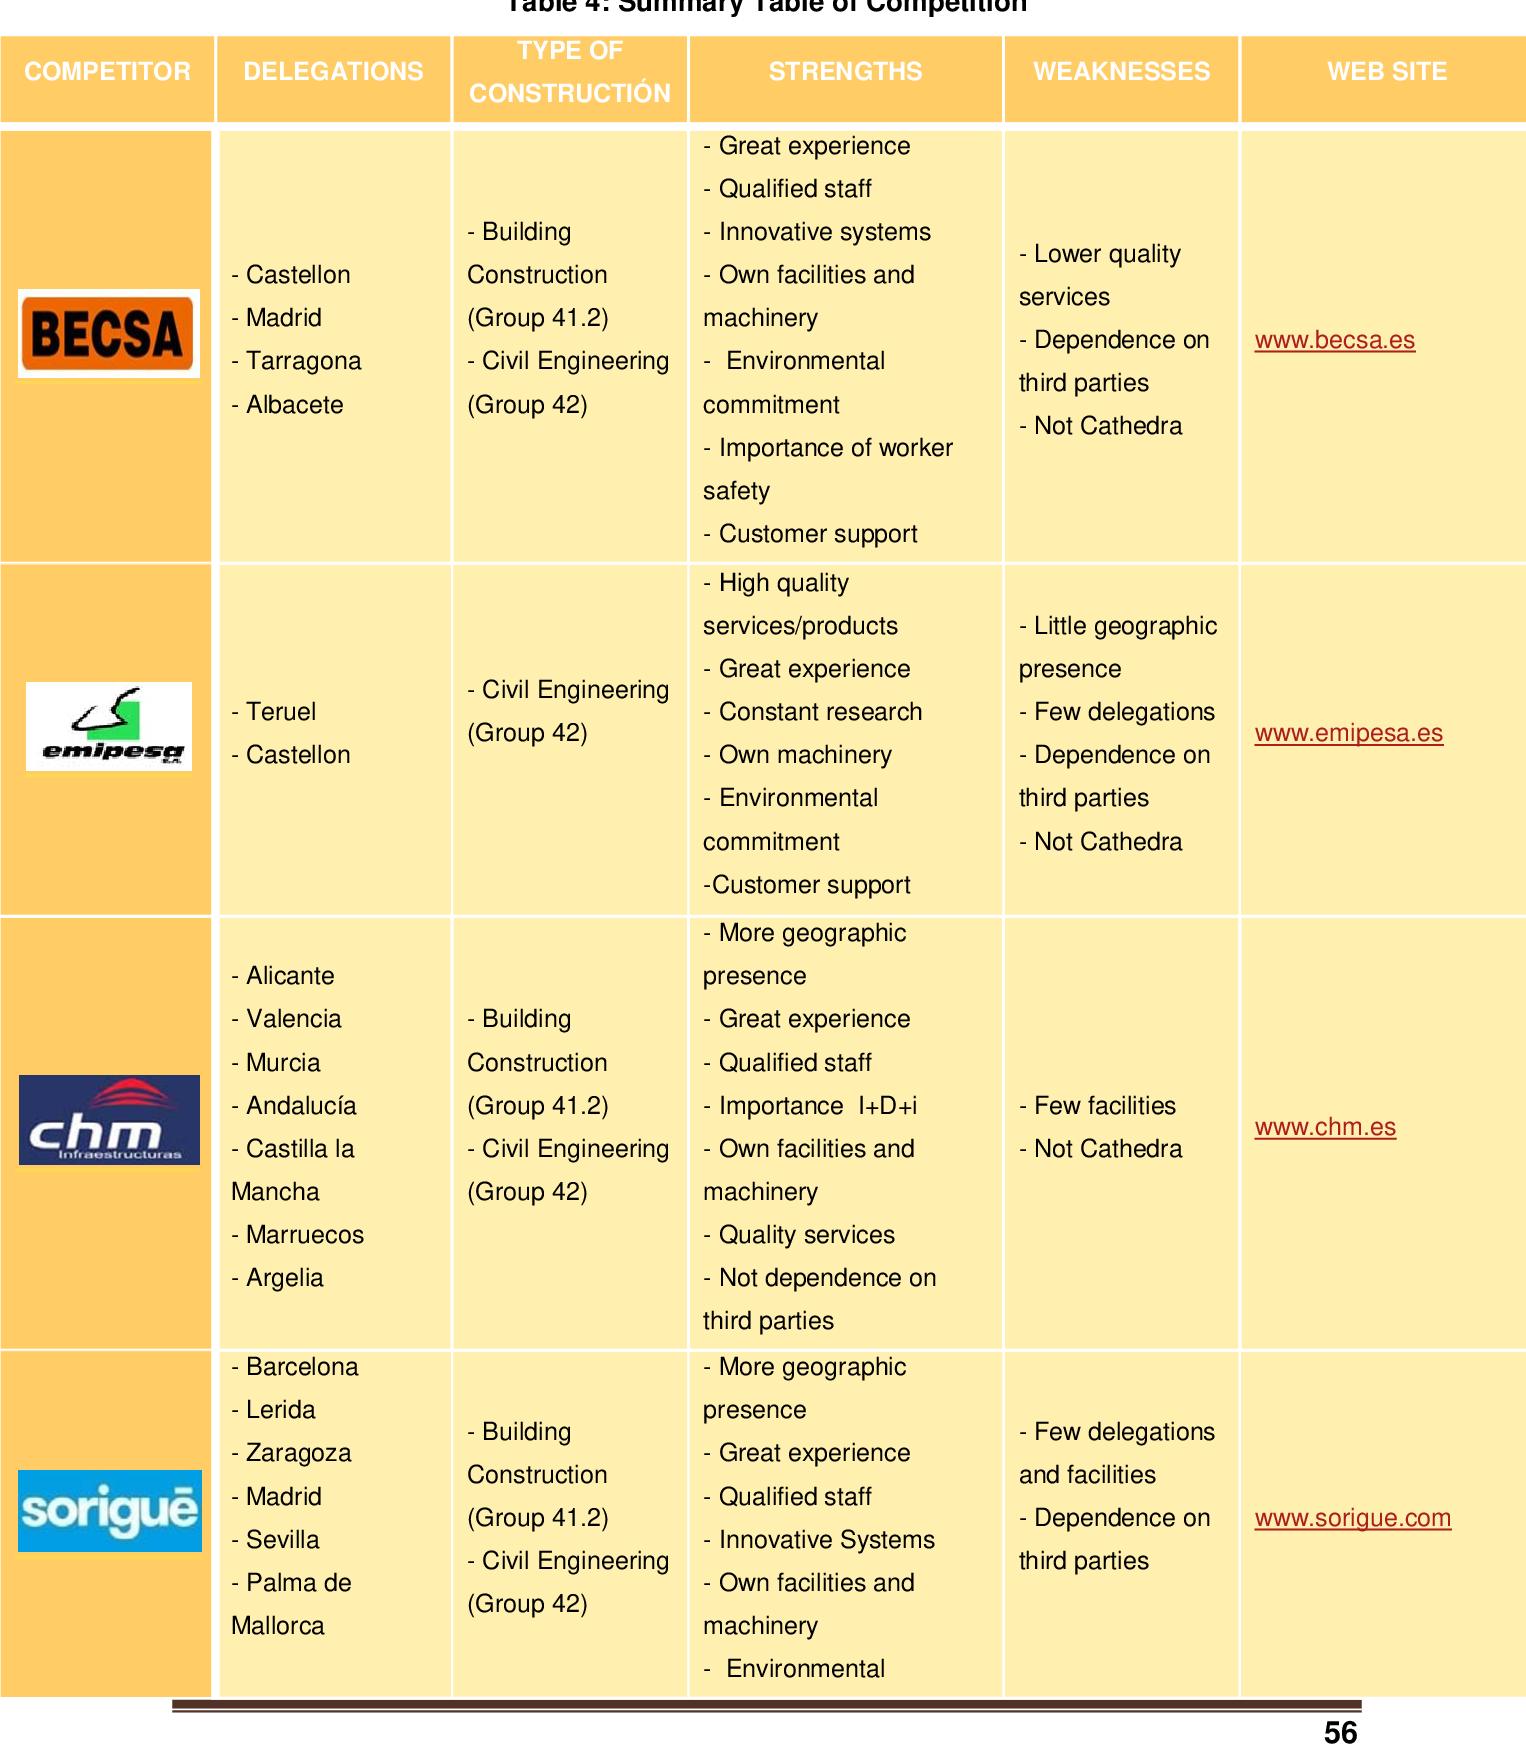 Marketing Plan Of The Construction Company Pavasal S A Semantic Scholar